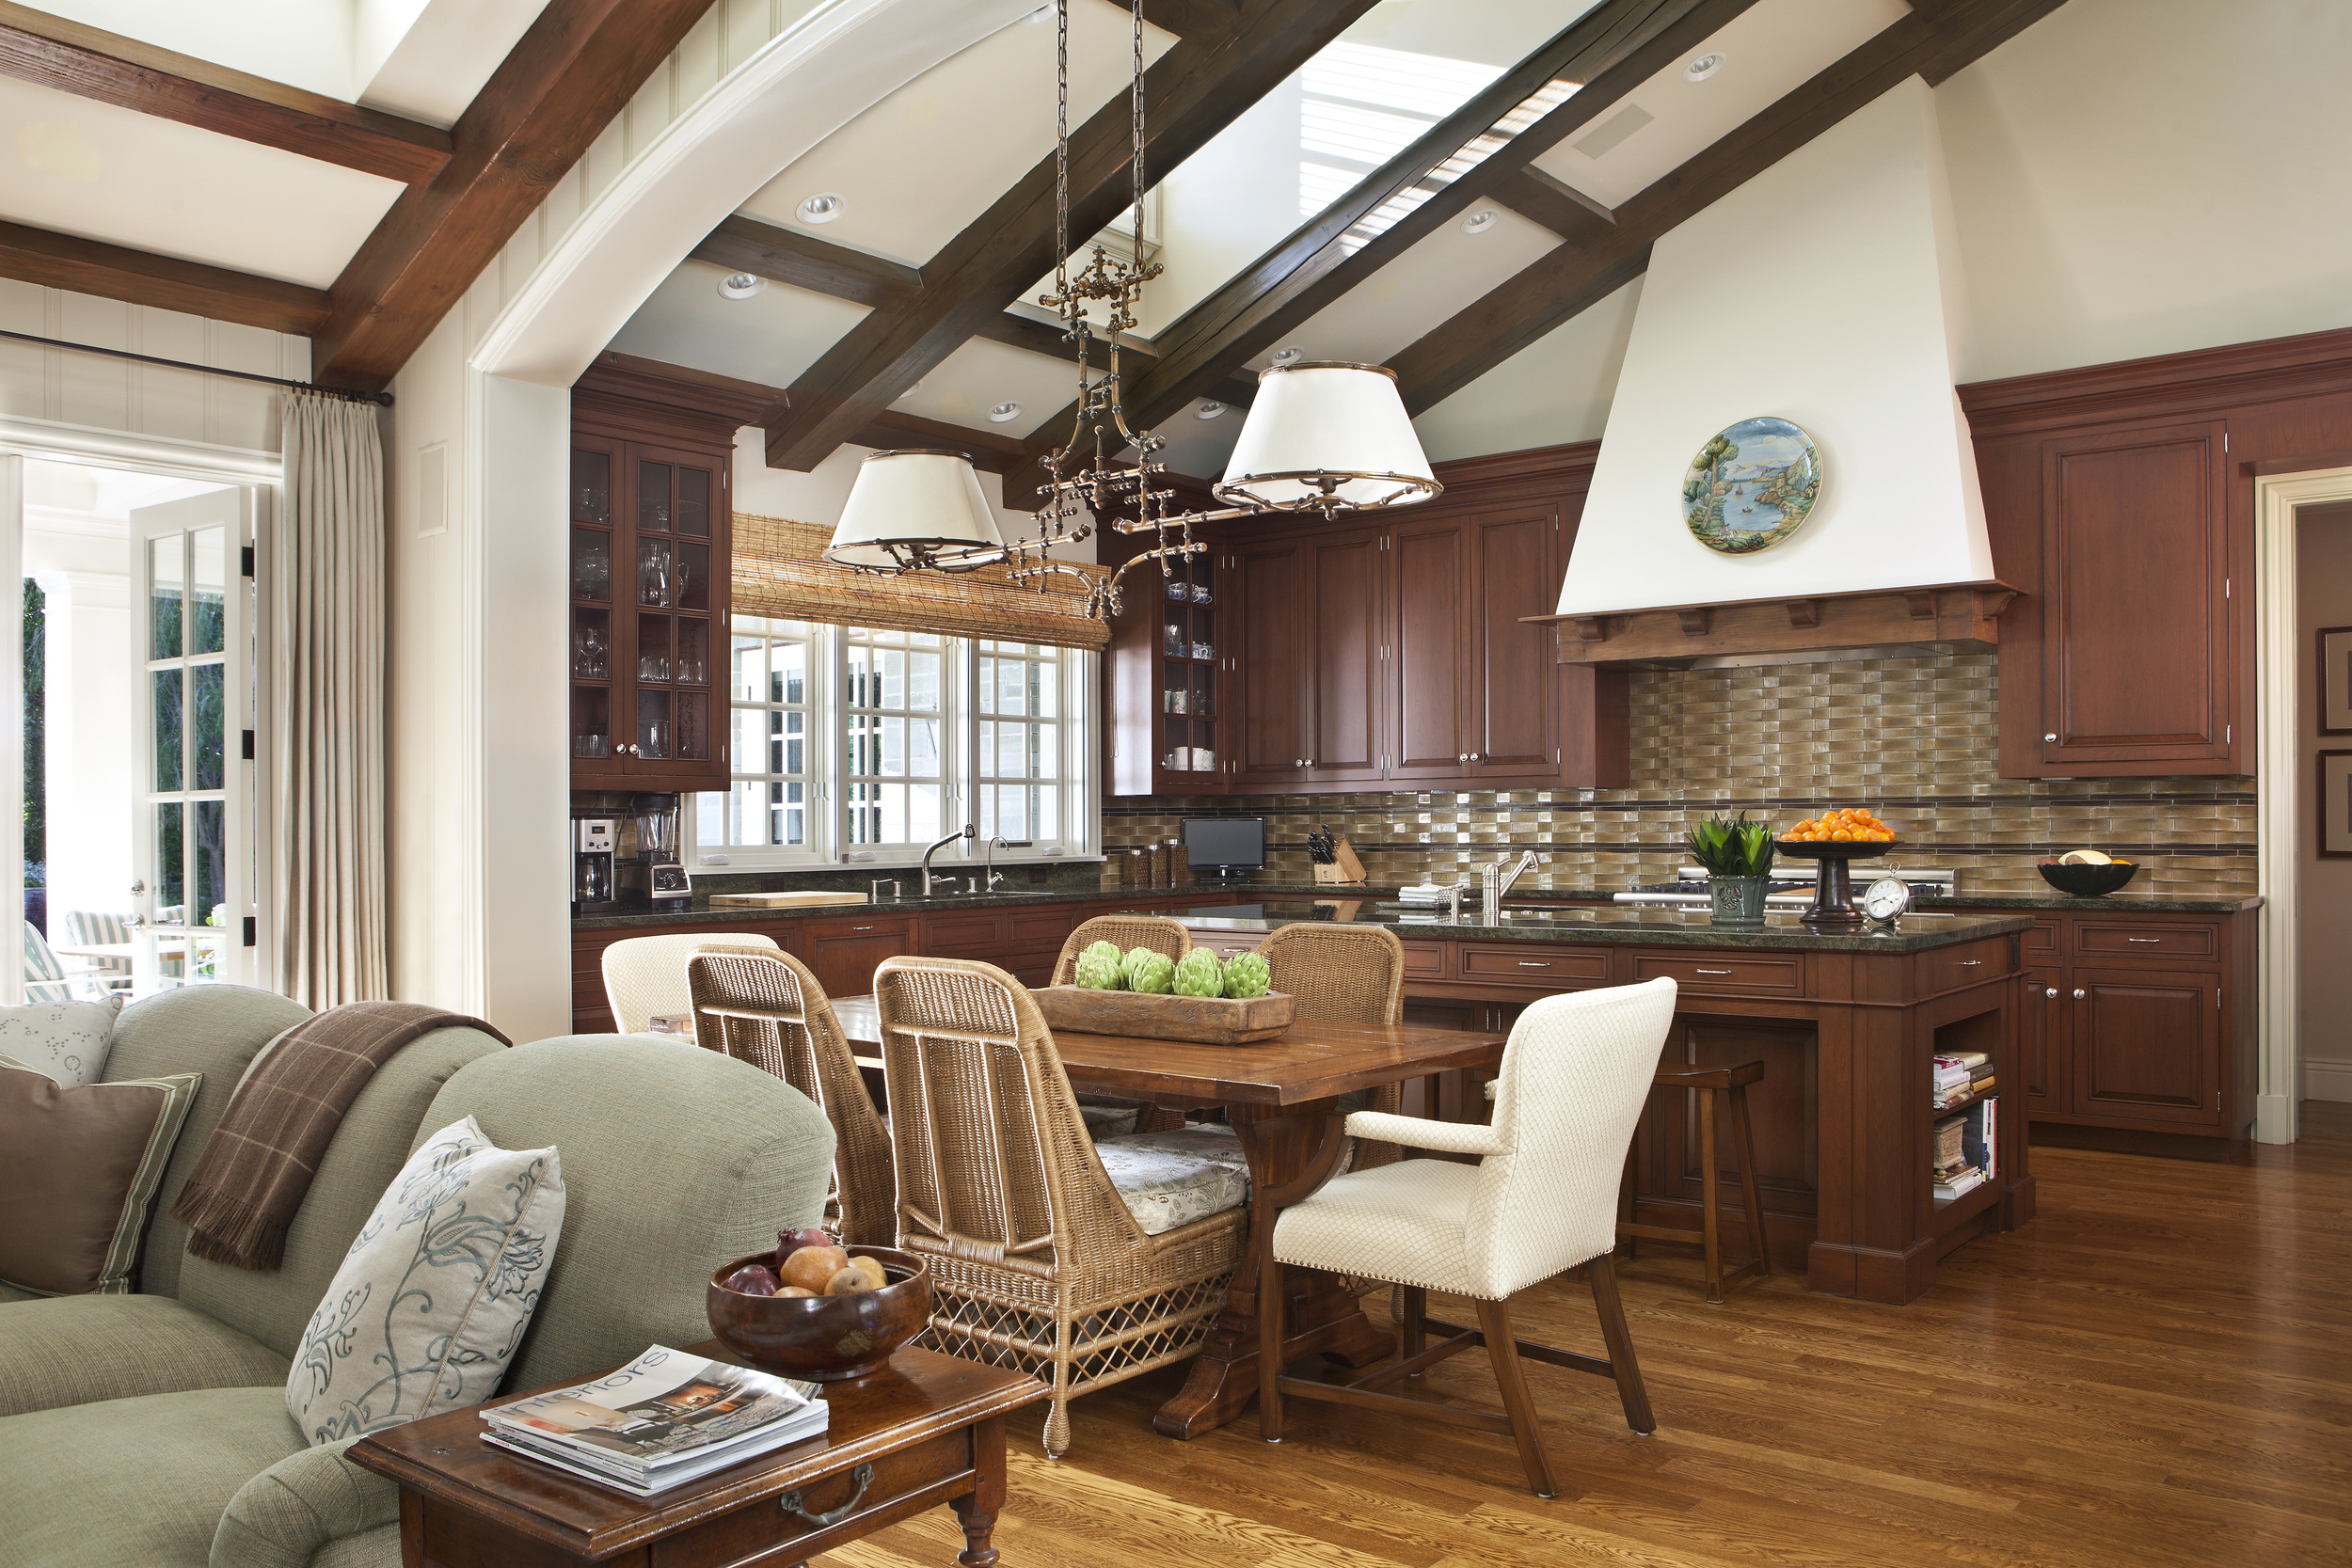 02 Brentwood Park Bluestone Manor House Kitchen.jpg